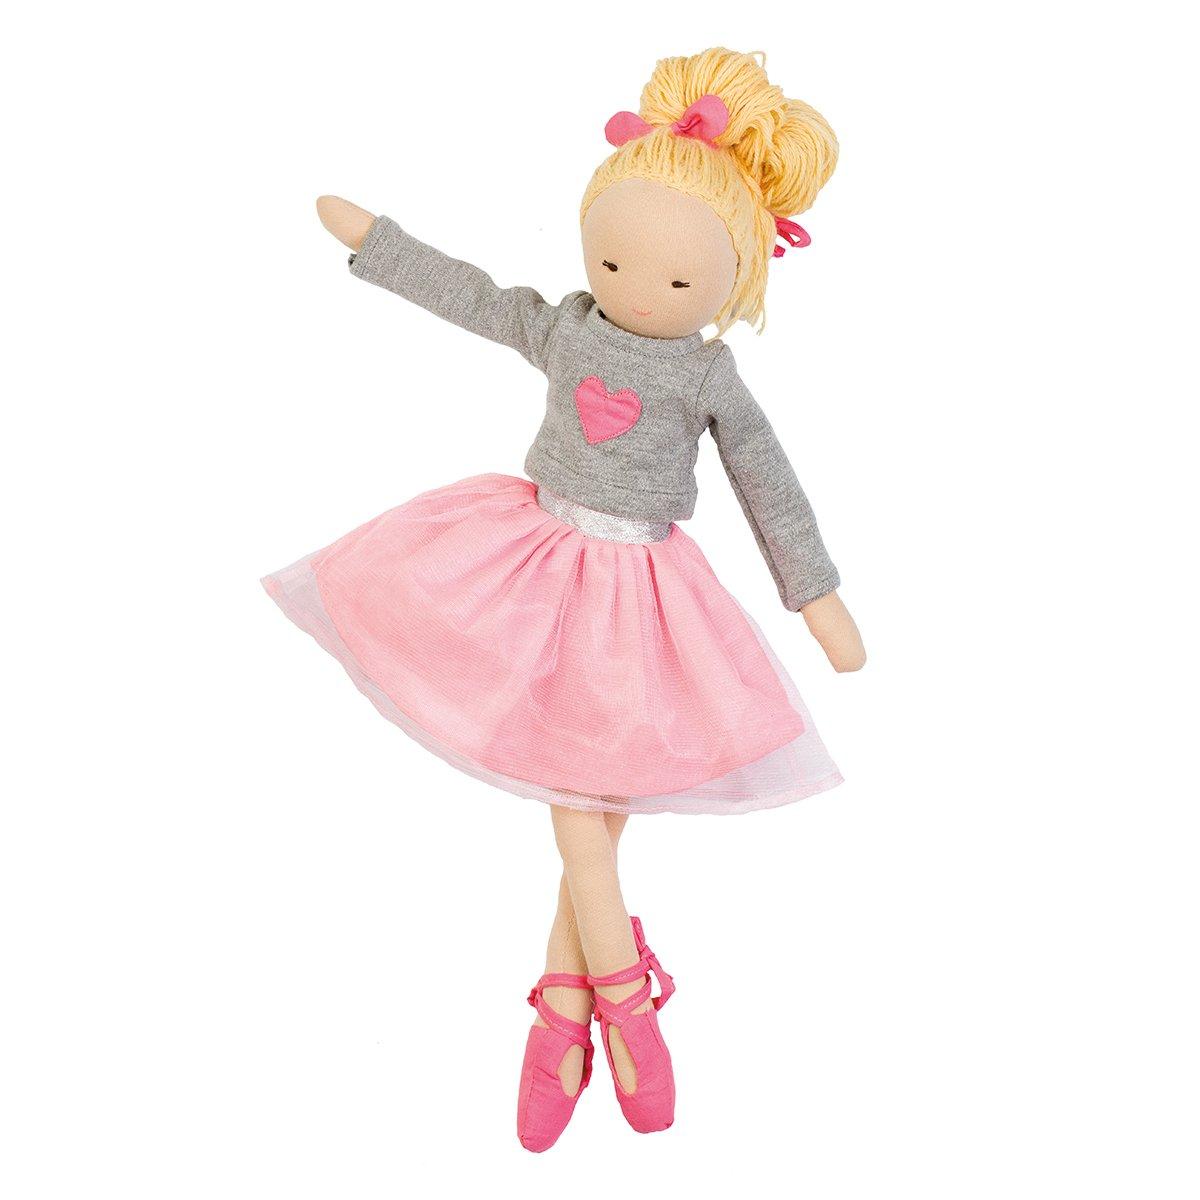 Character doll - Olivia